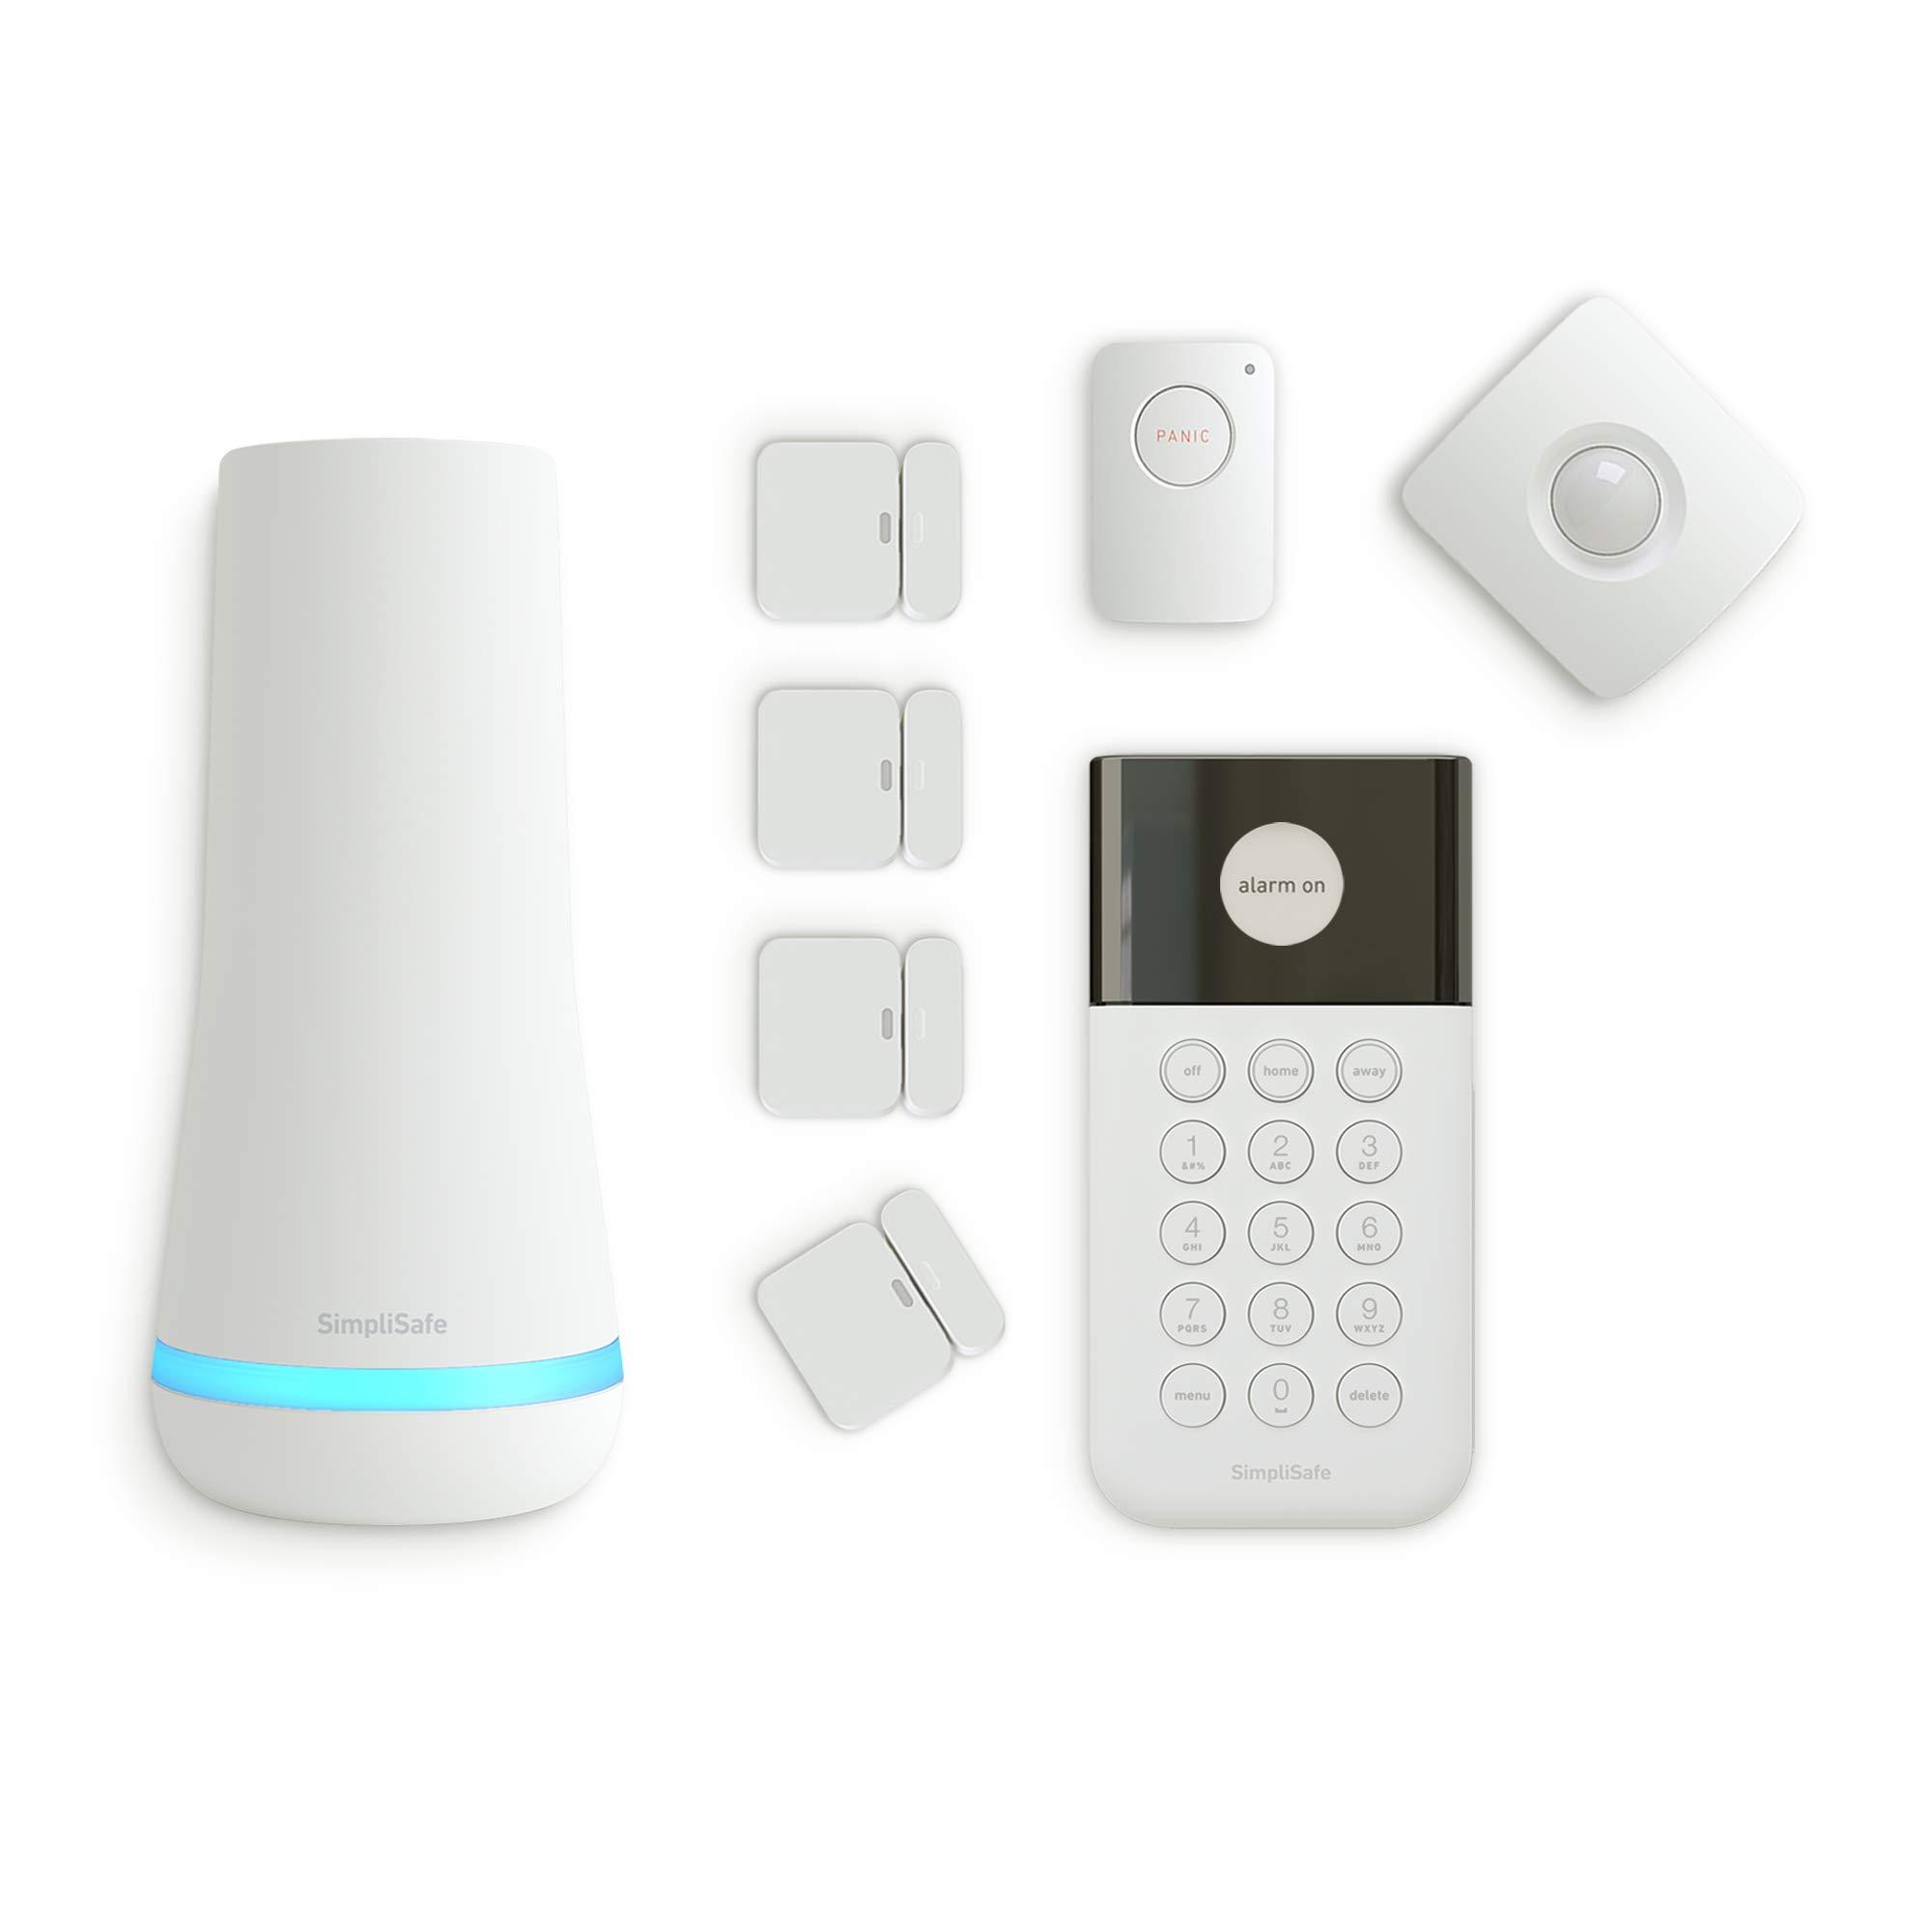 SimpliSafe Wireless Security System Setup